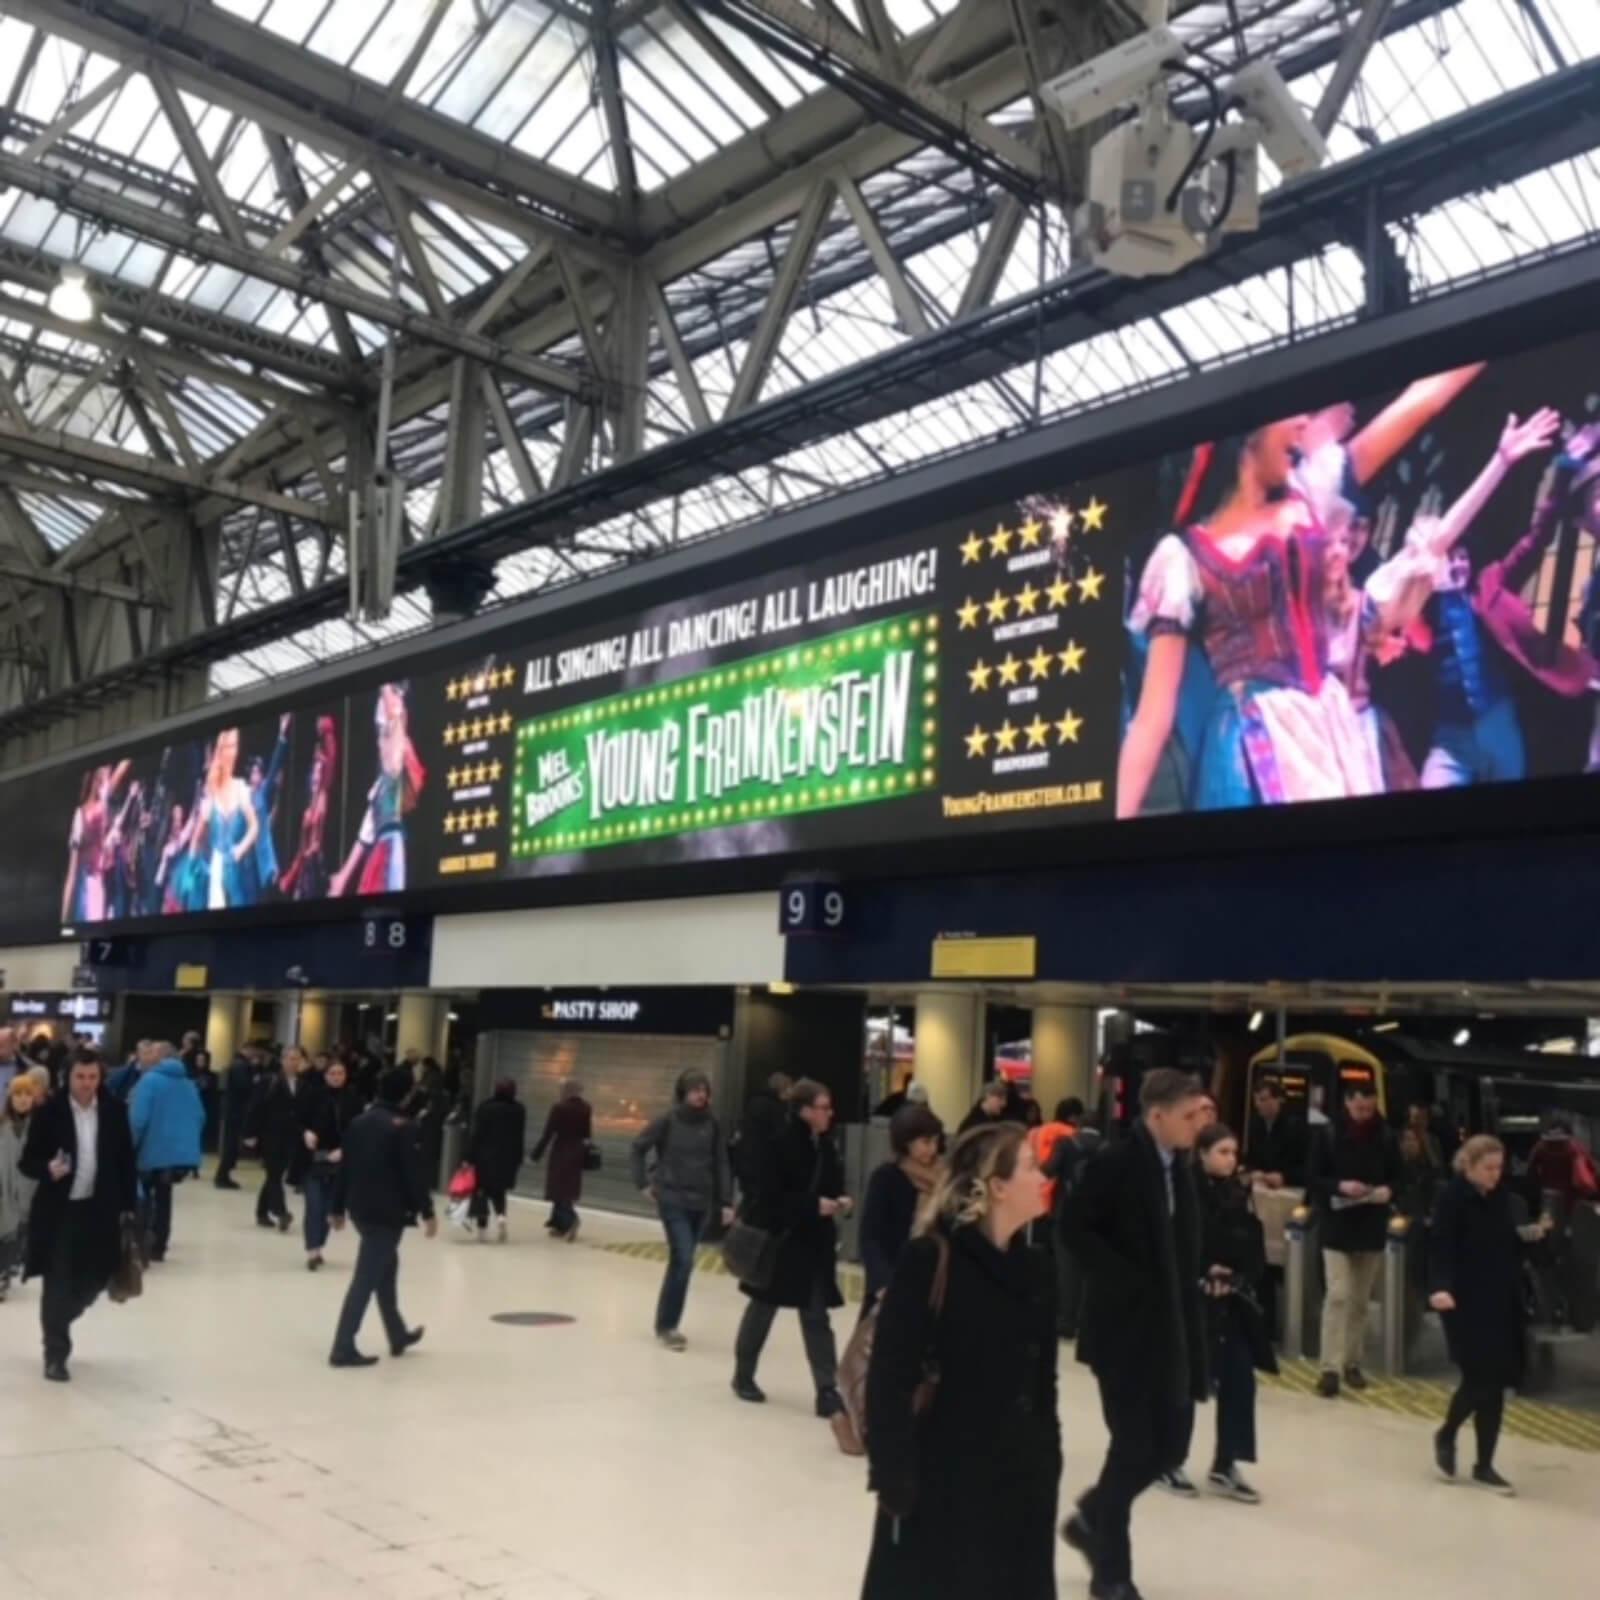 Huge banner of Young Frankenstein (West End) London at Paddington Train Station.